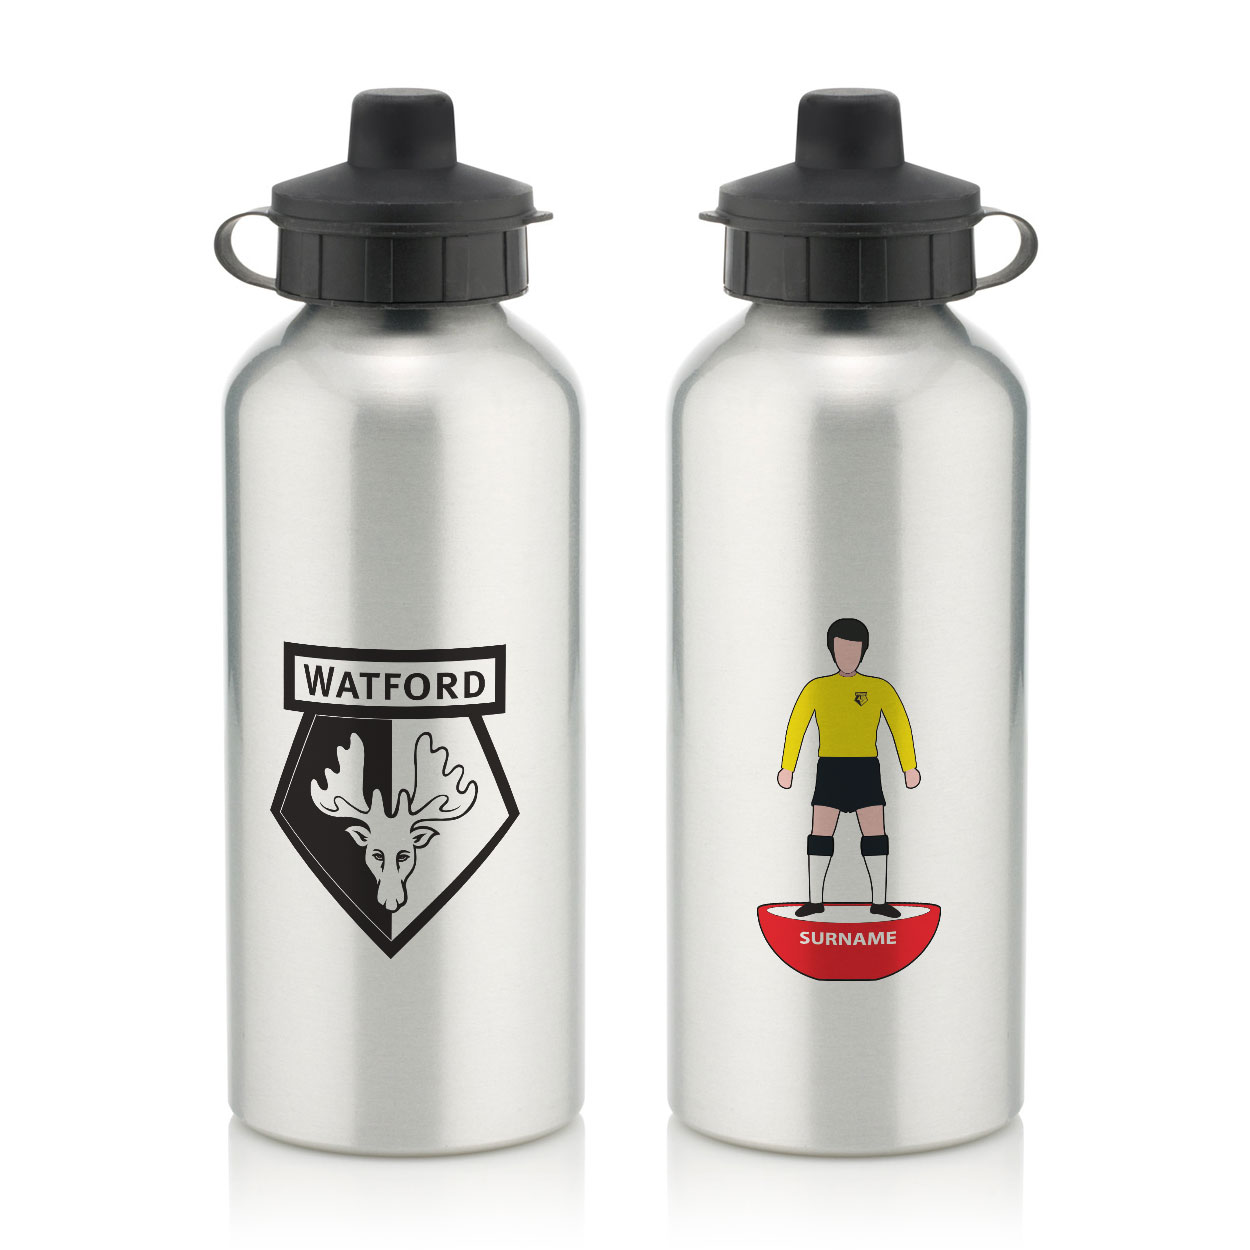 Watford FC Player Figure Water Bottle